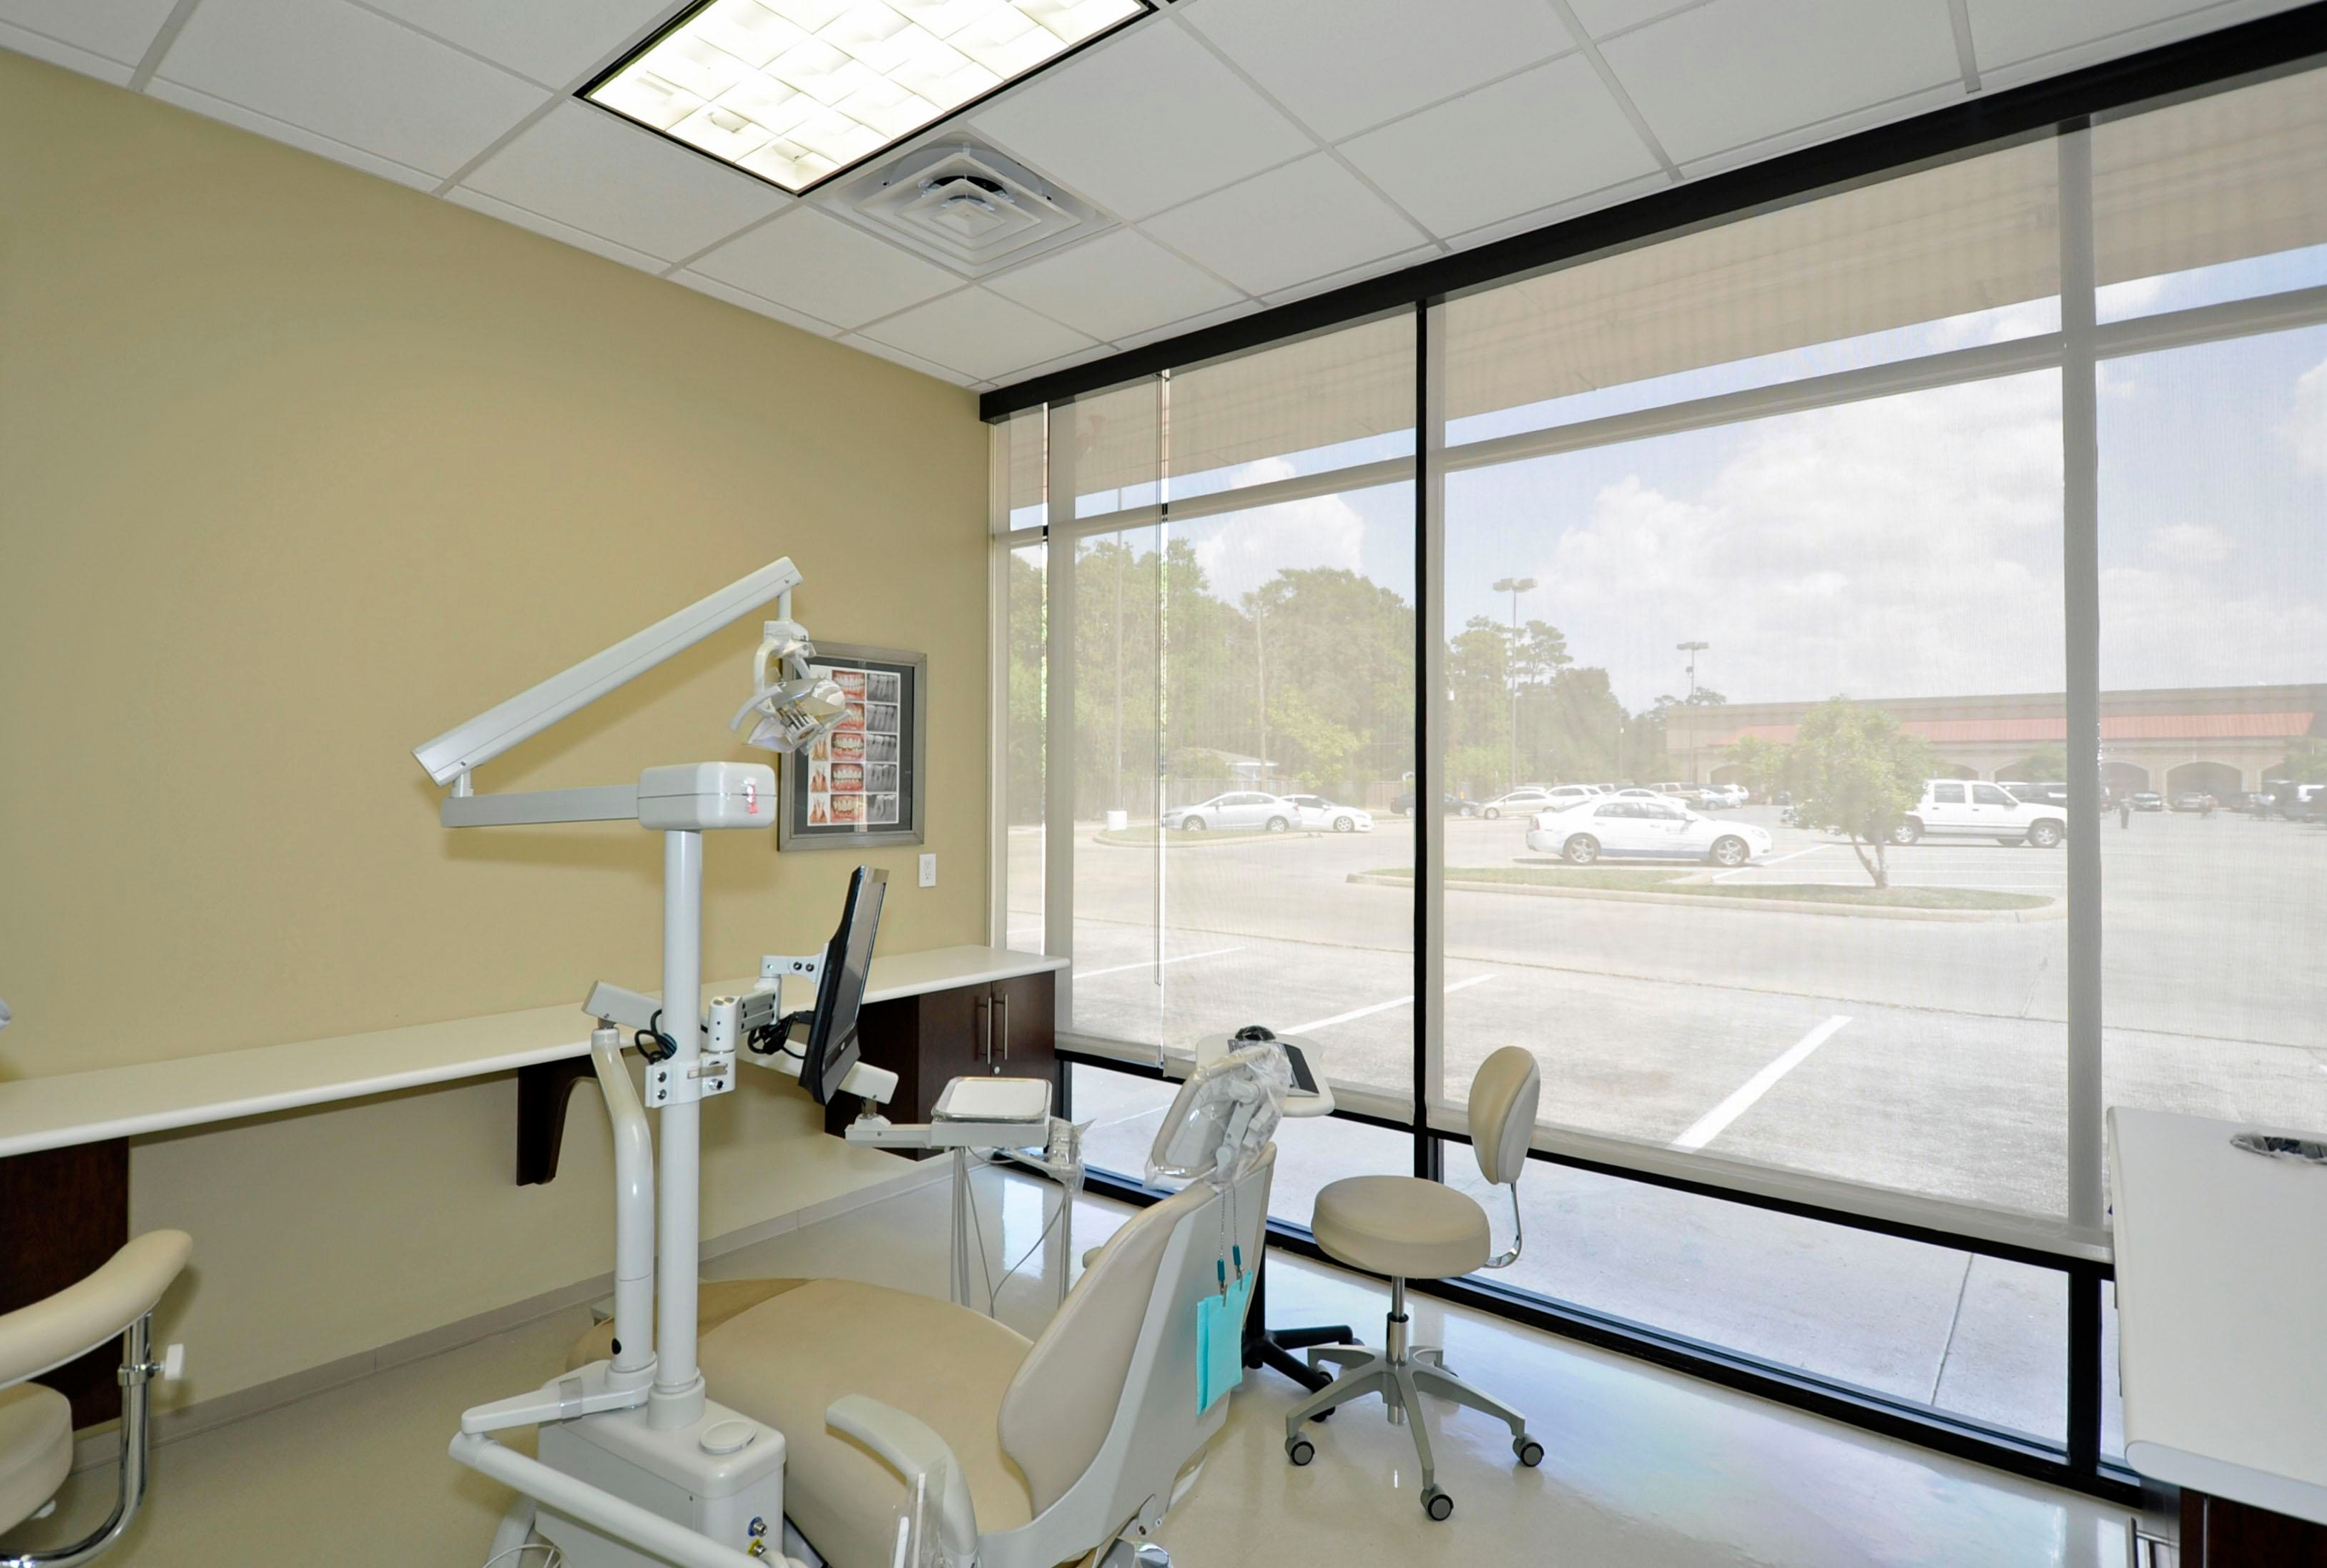 Oak Forest Dental Group and Orthodontics image 3